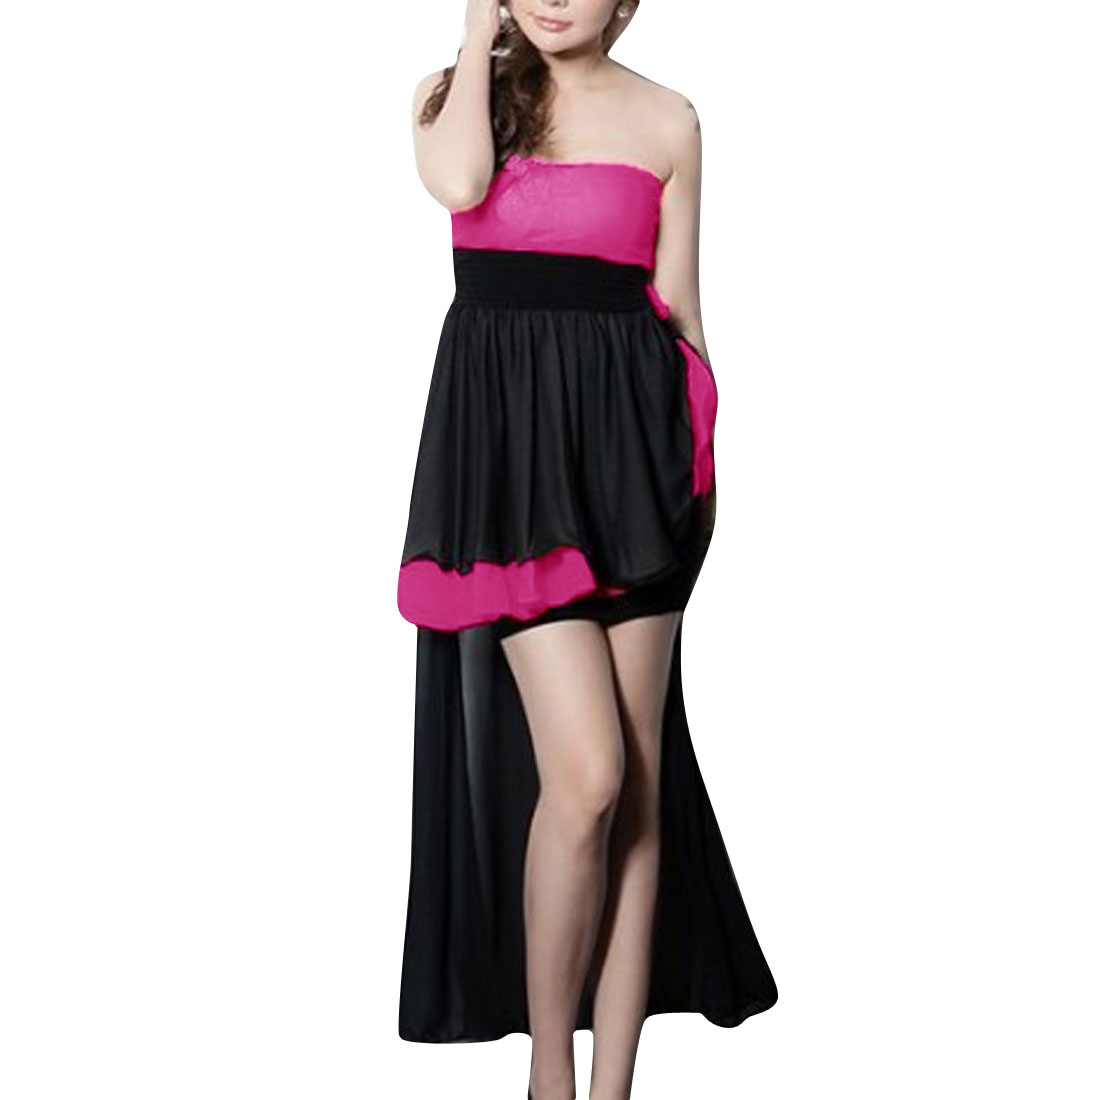 Woman Strapless Padded Bust Stretchy Hot Pink Black Irregular Hem Dress XS